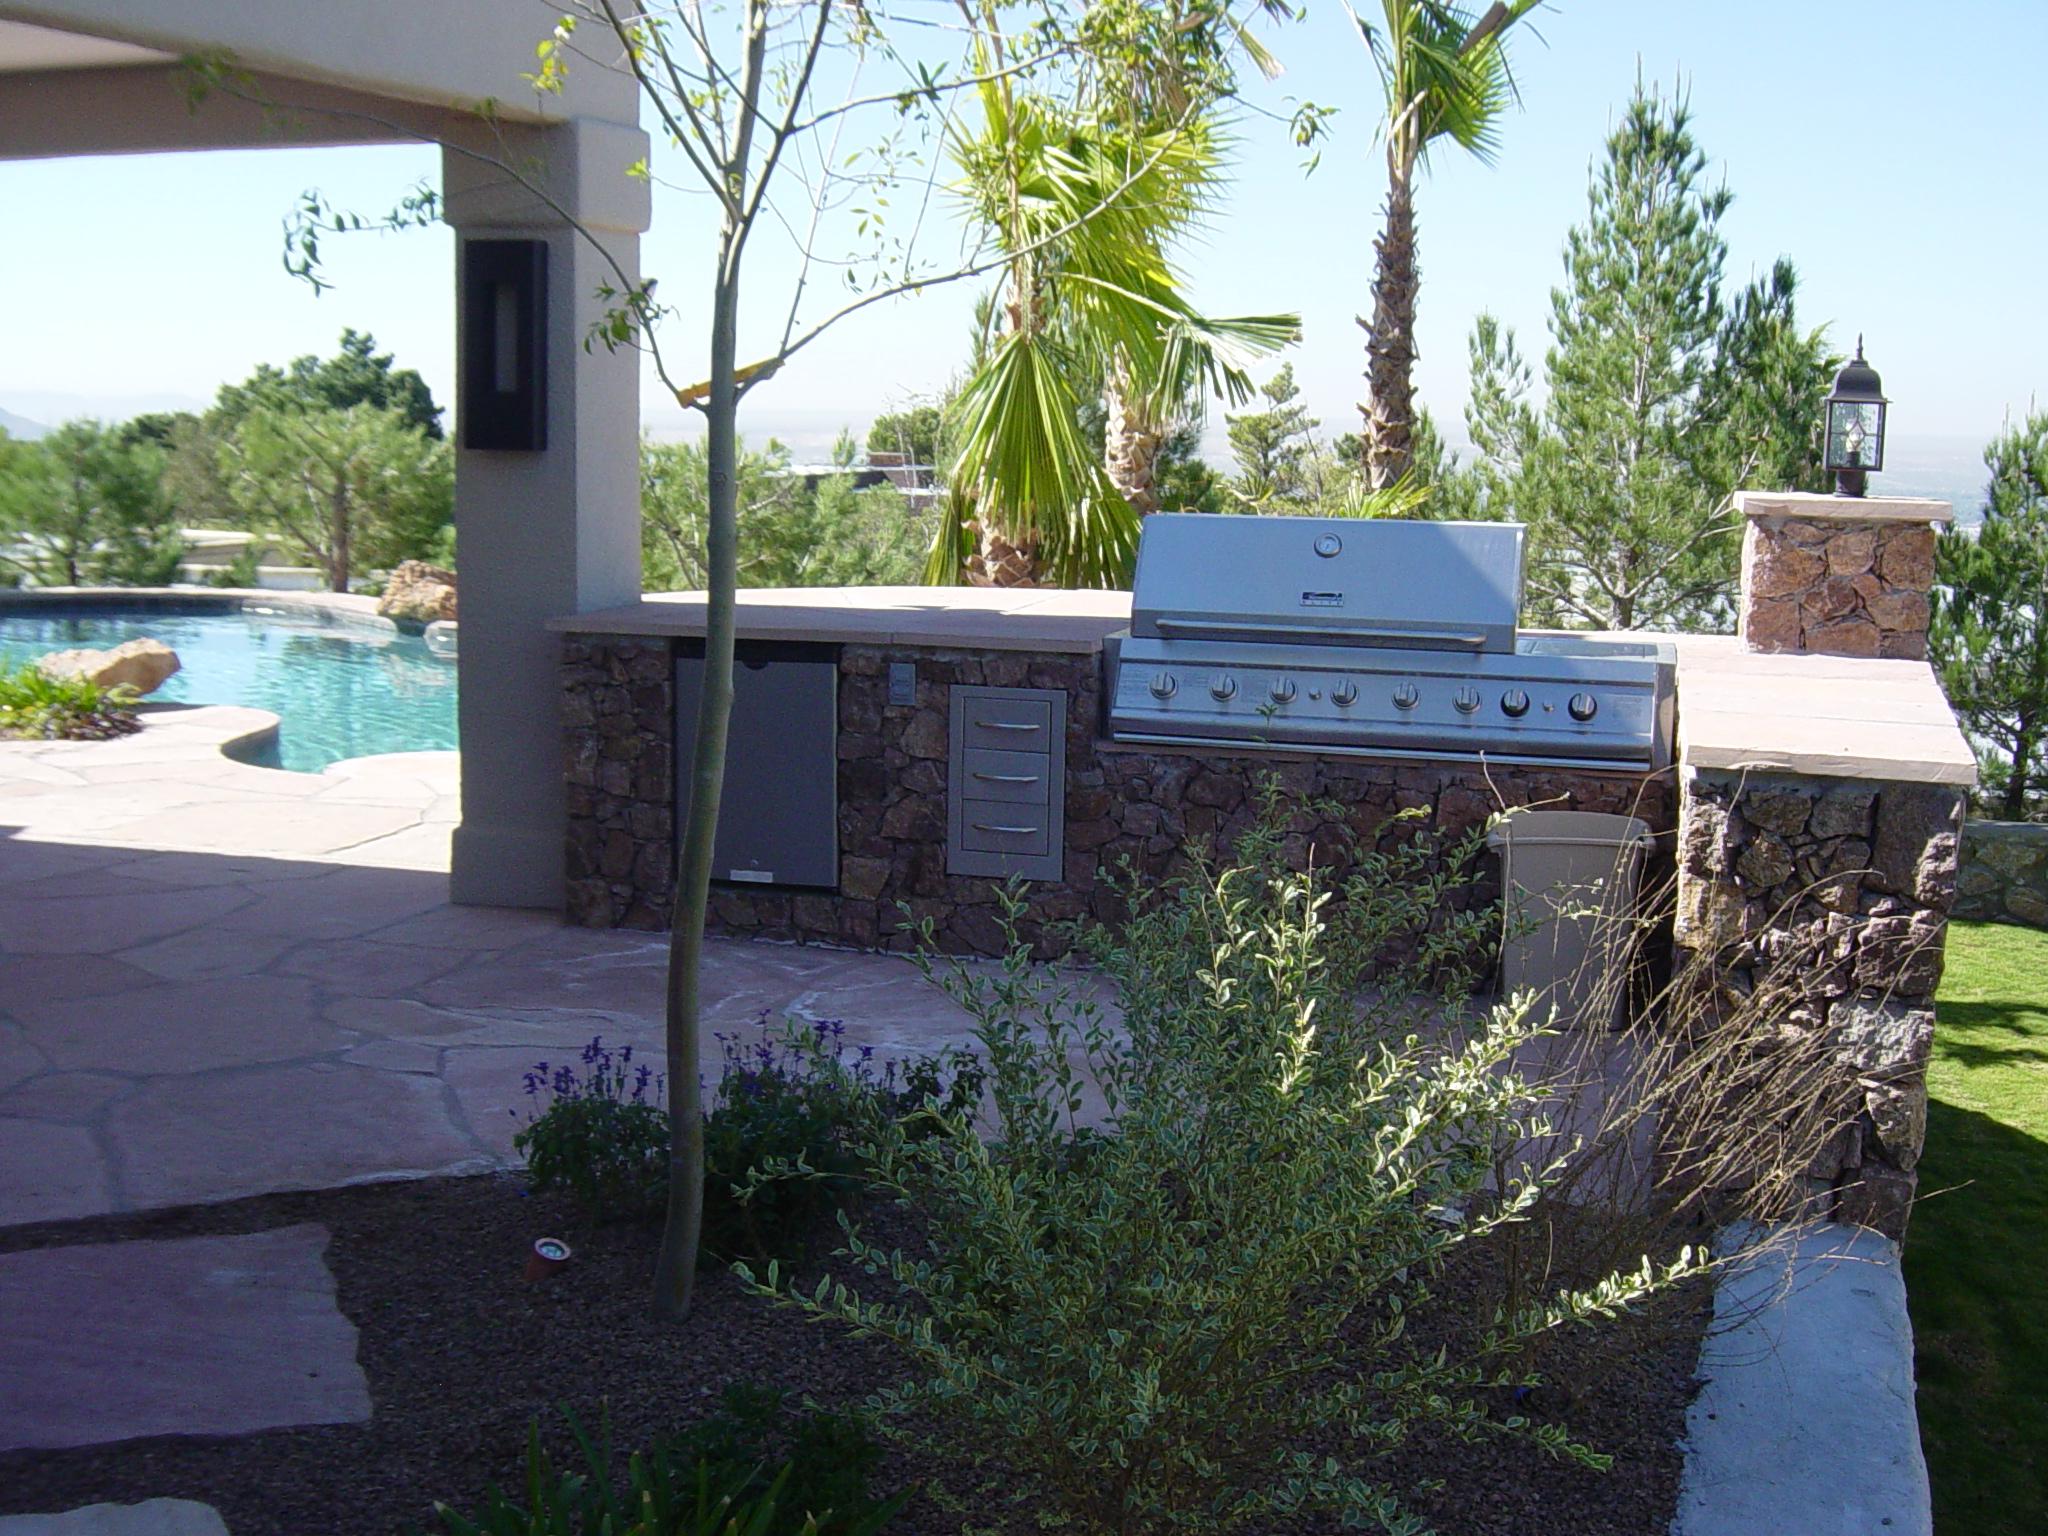 Dsc00889 paradise pools of el paso for Pool design el paso tx